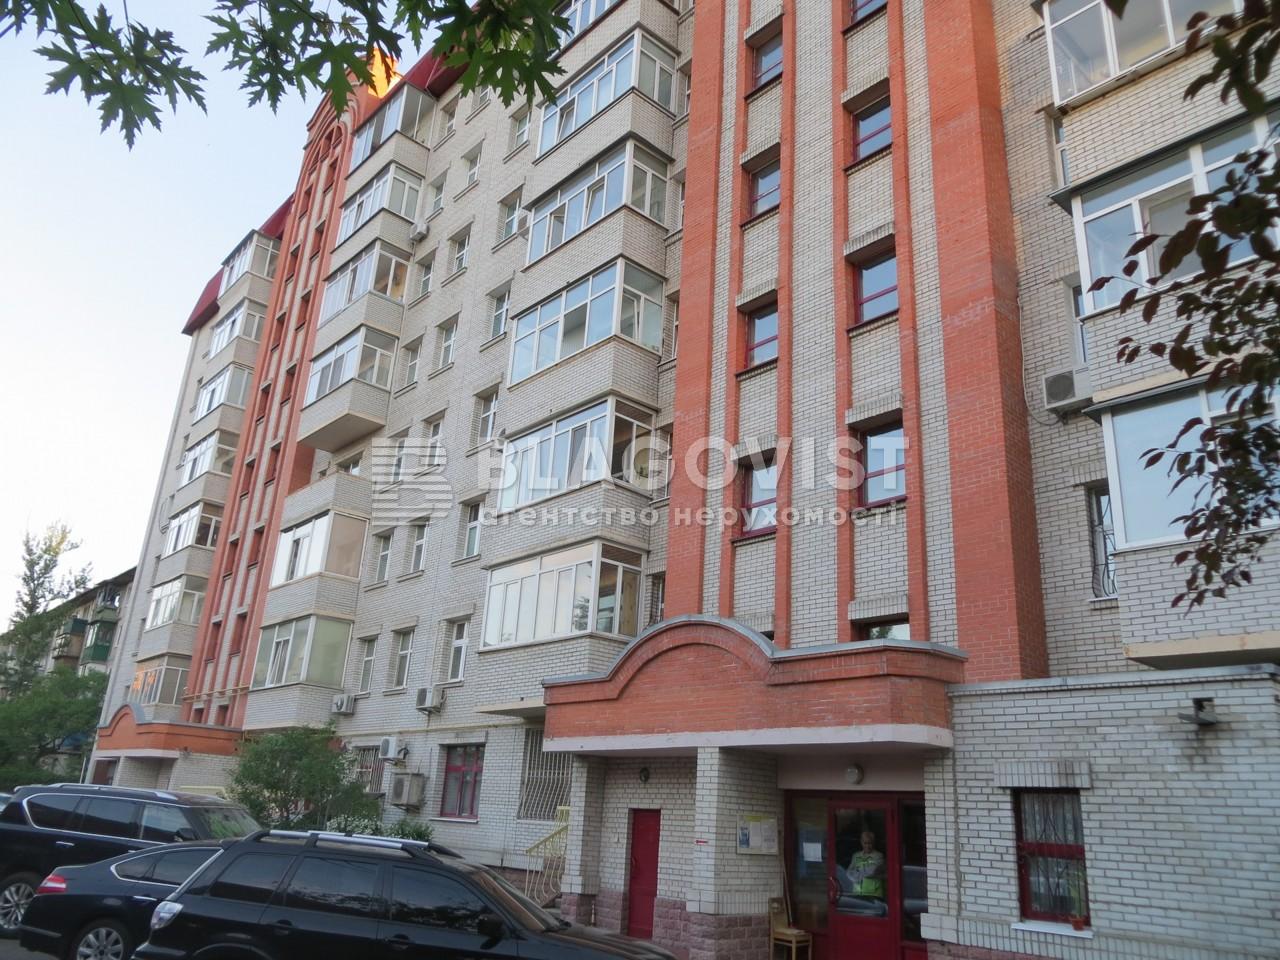 Квартира F-39218, Пожарского, 4, Киев - Фото 3